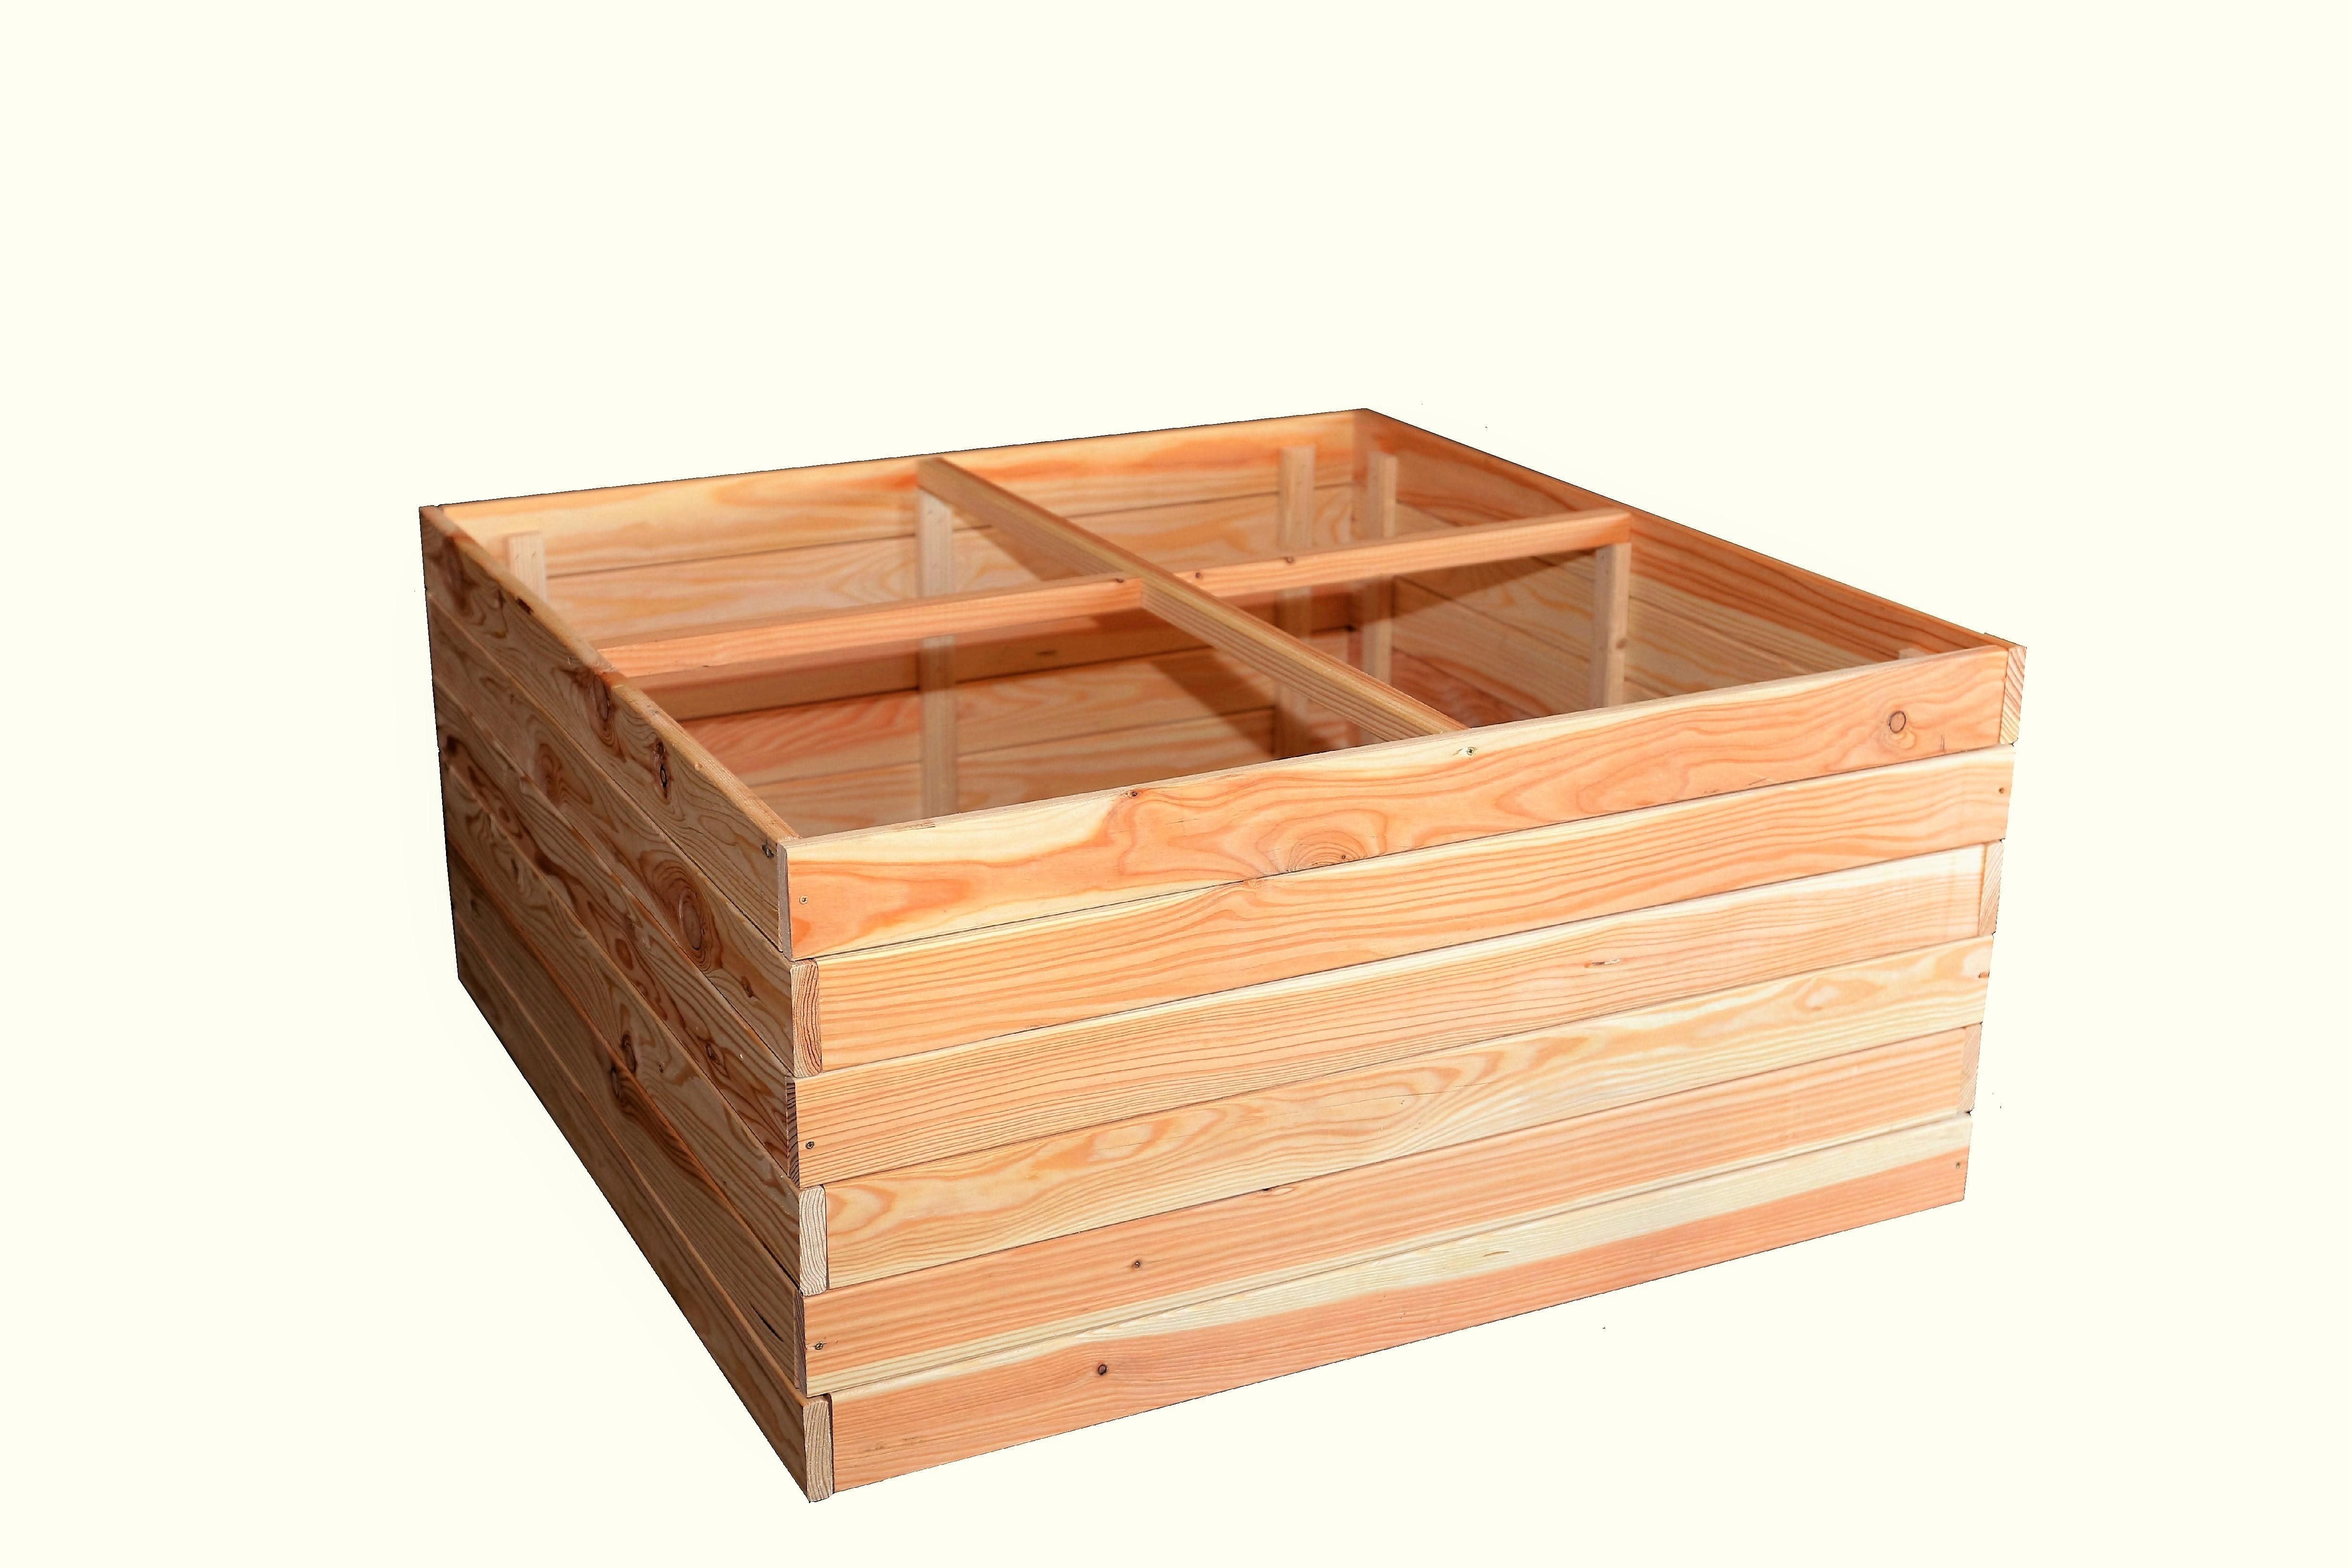 hoq hochbeet 100x100x48 cm aus 18 mm l rchenholz mit. Black Bedroom Furniture Sets. Home Design Ideas